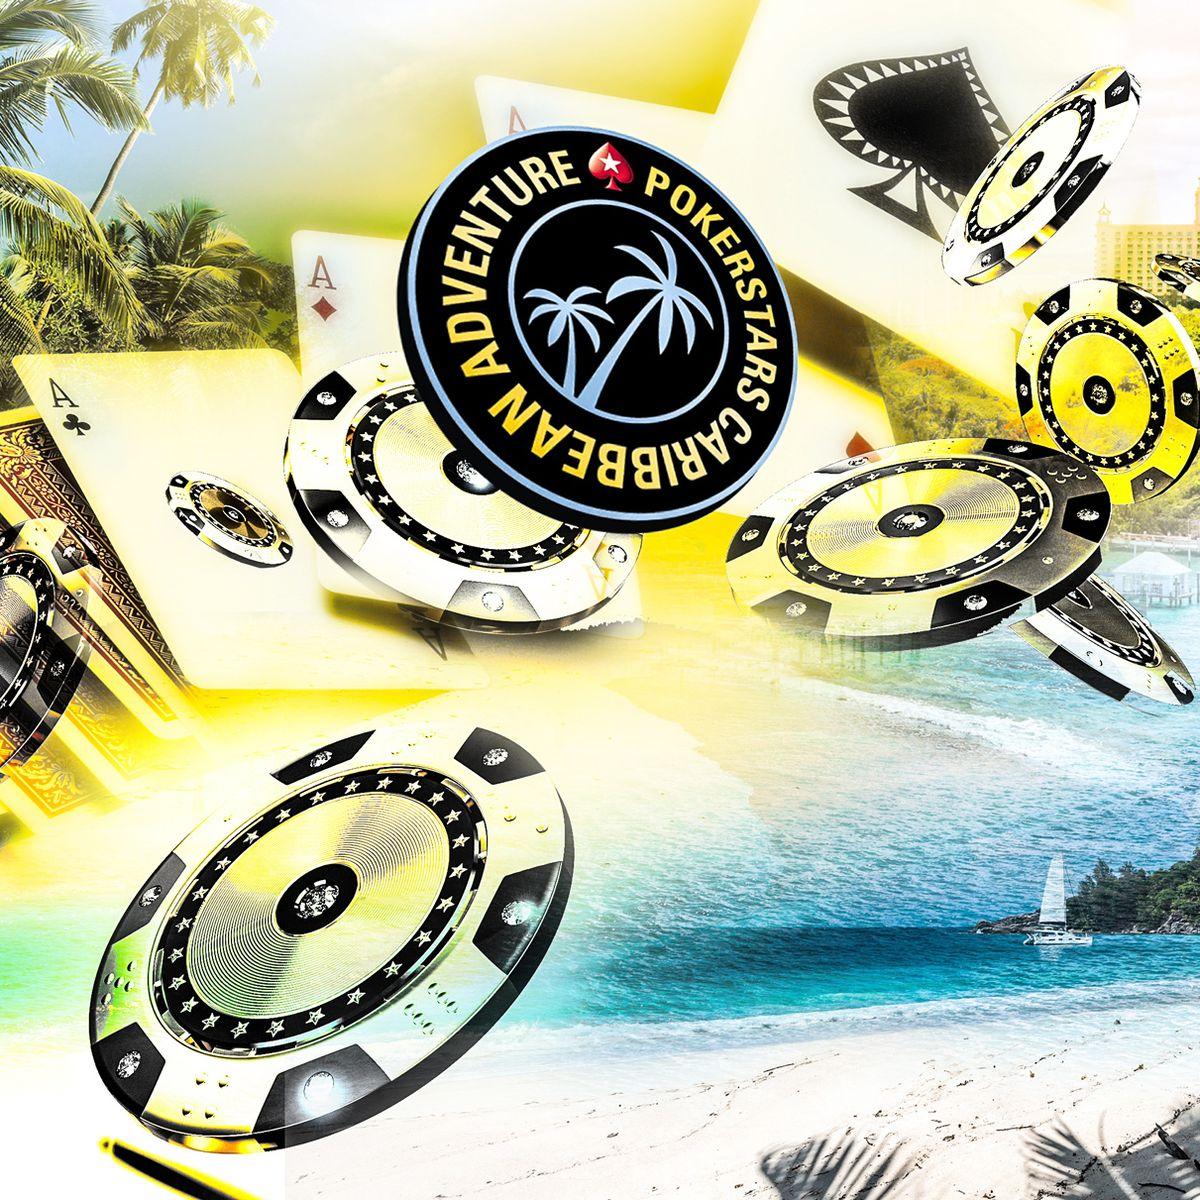 Pokerfirma